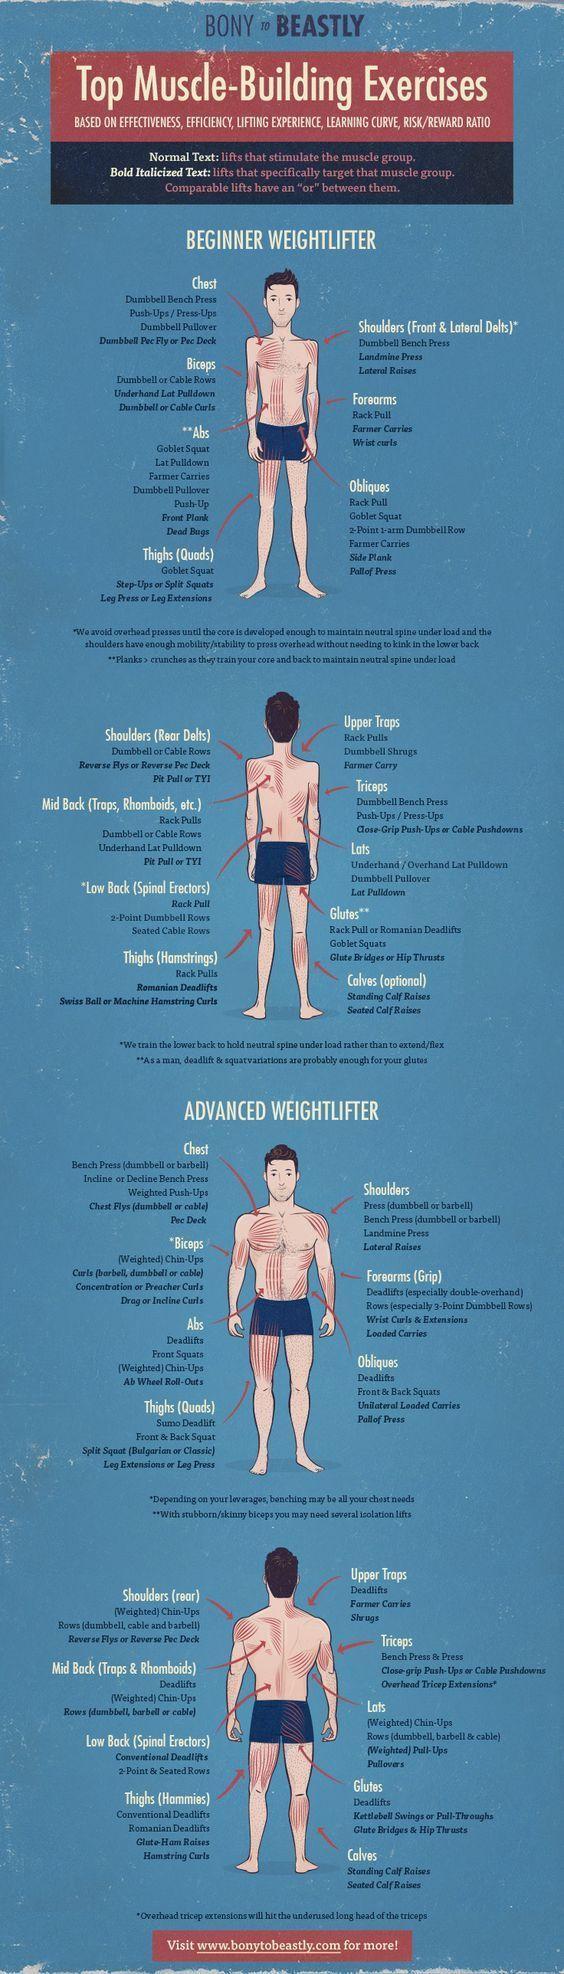 best menus fitness exercises images on pinterest circuit